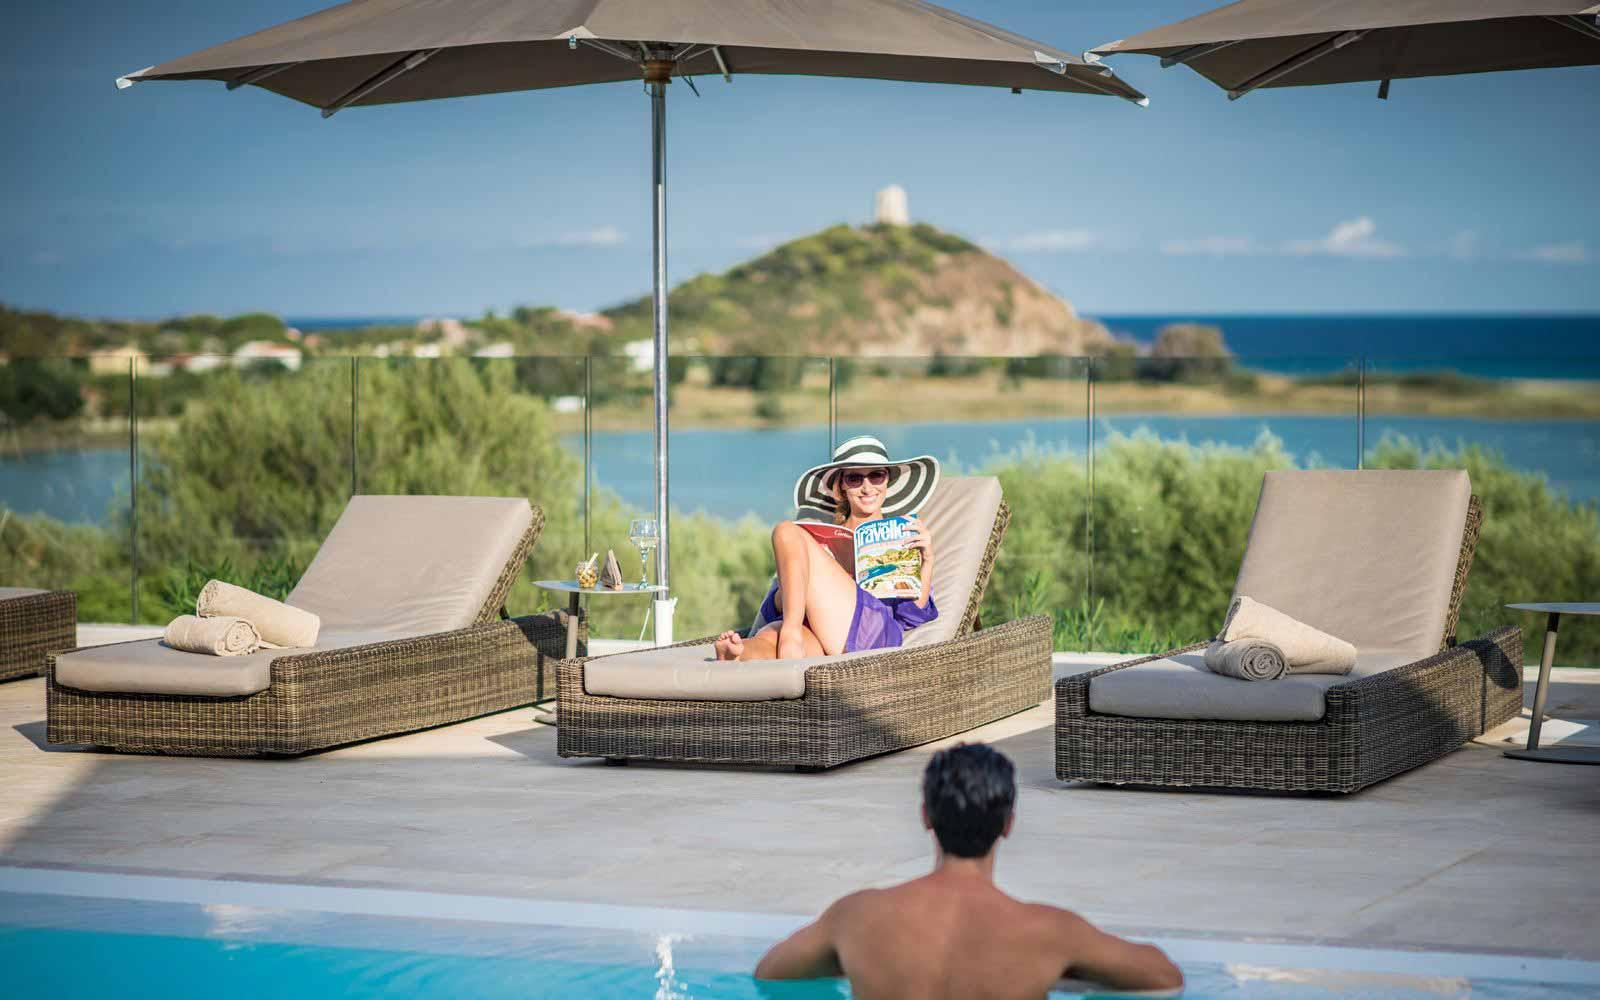 Relax by swimming pool at the Chia laguna resort